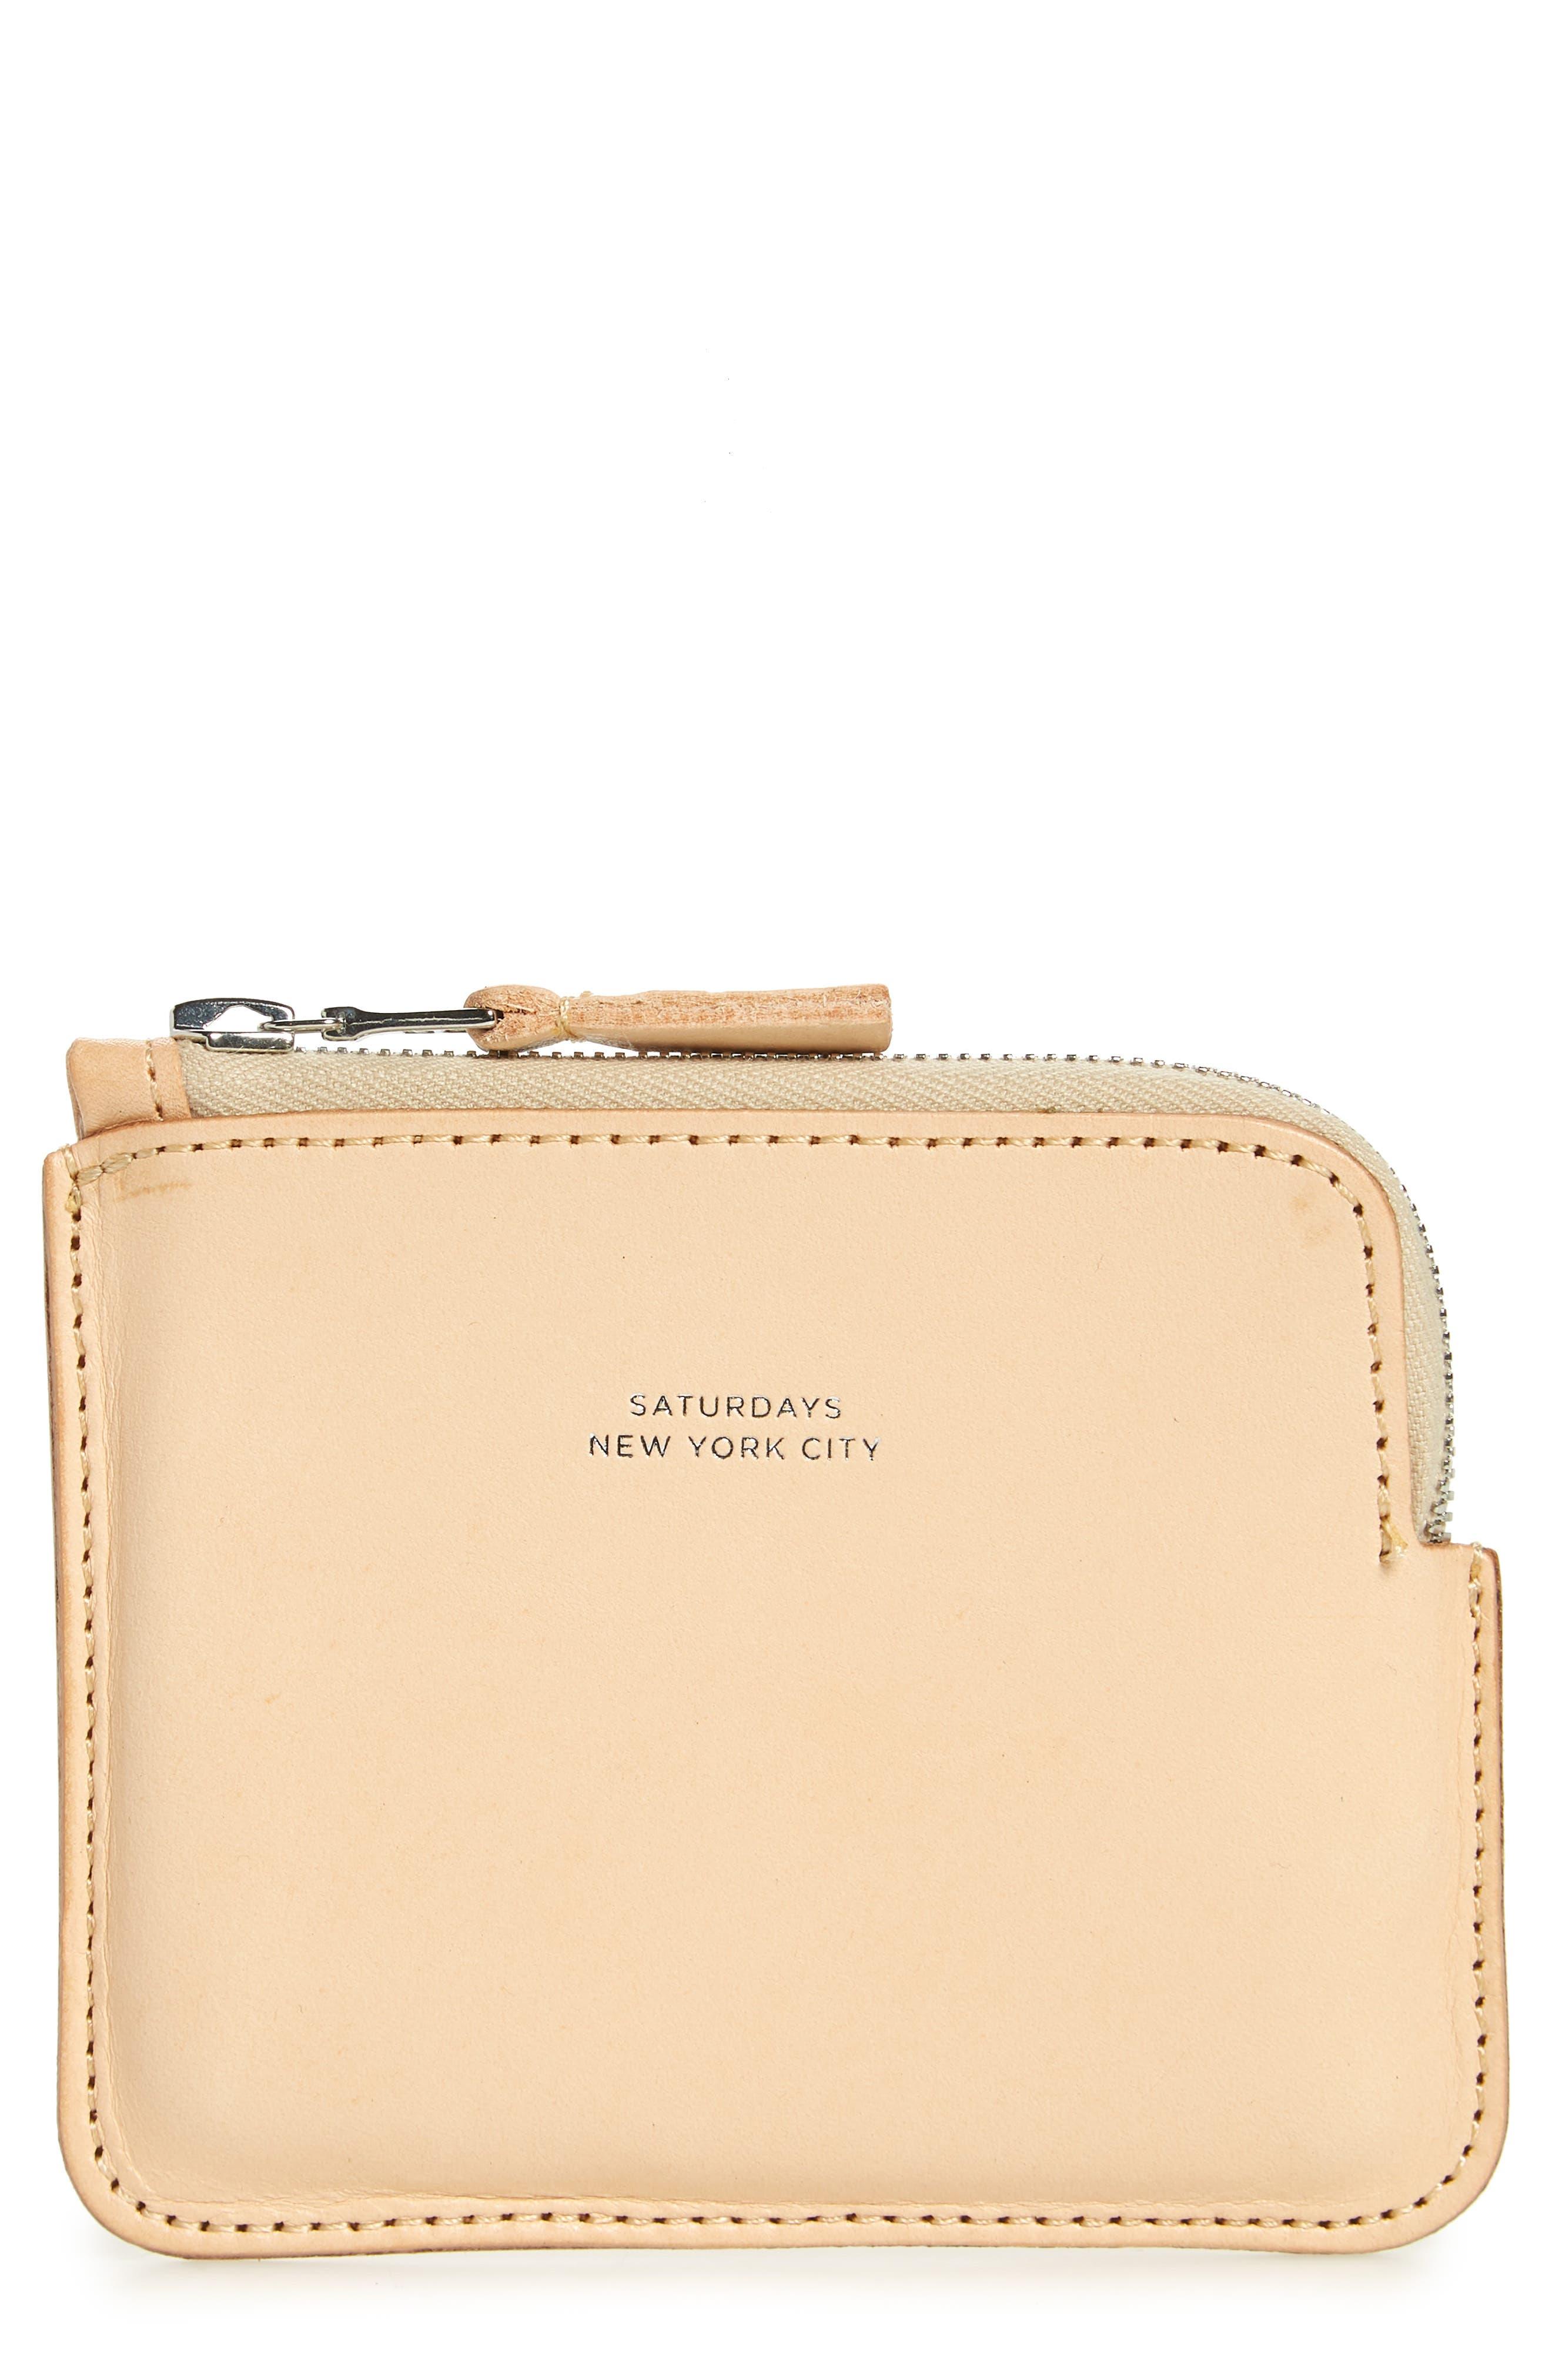 Leather Half Zip Wallet,                             Main thumbnail 1, color,                             Vegetable Tan